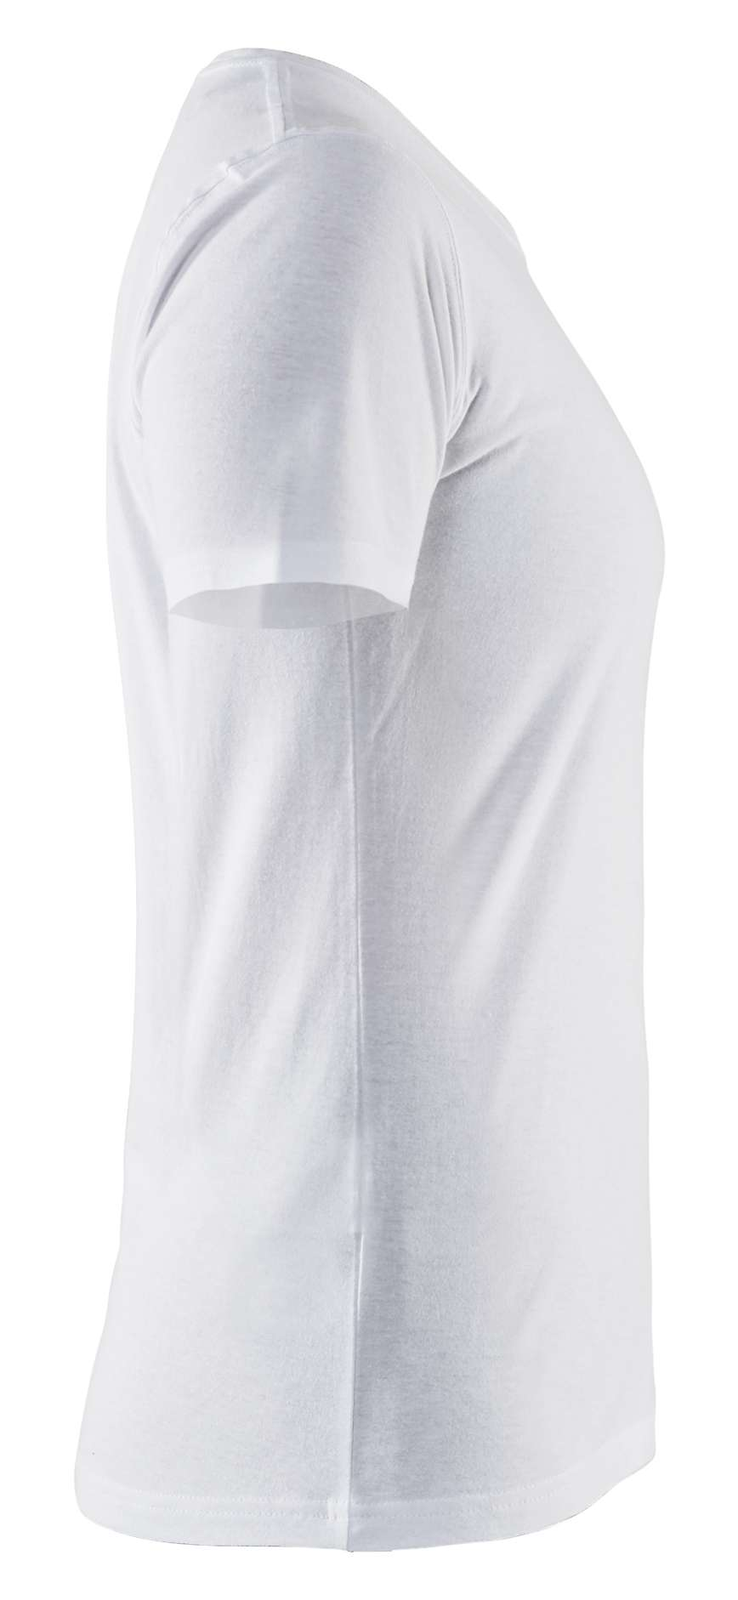 Blaklader Dames T-shirts 33341042 wit(1000)